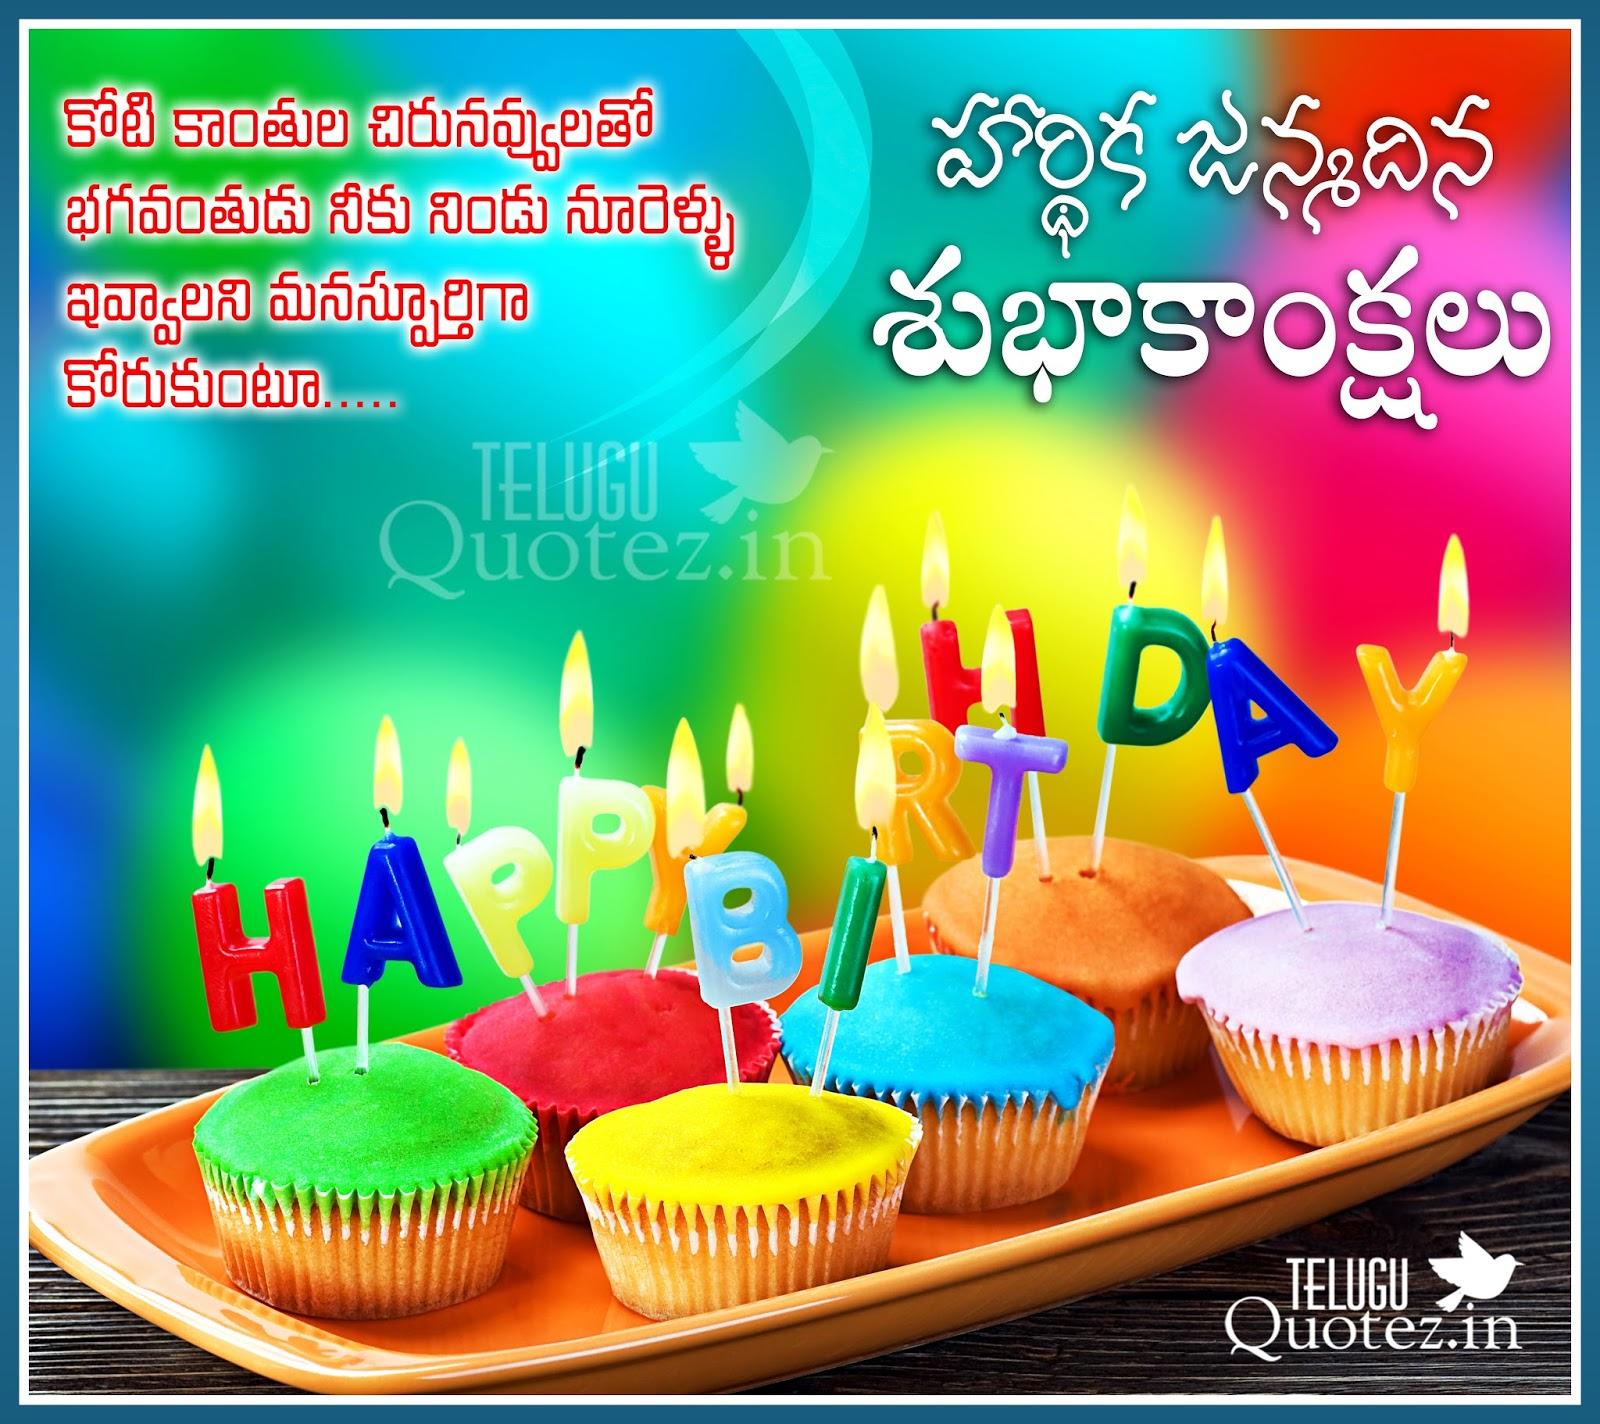 Happy Birthday Quotes In Hindi: Latest Happy Birthday Quotes In Telugu Language